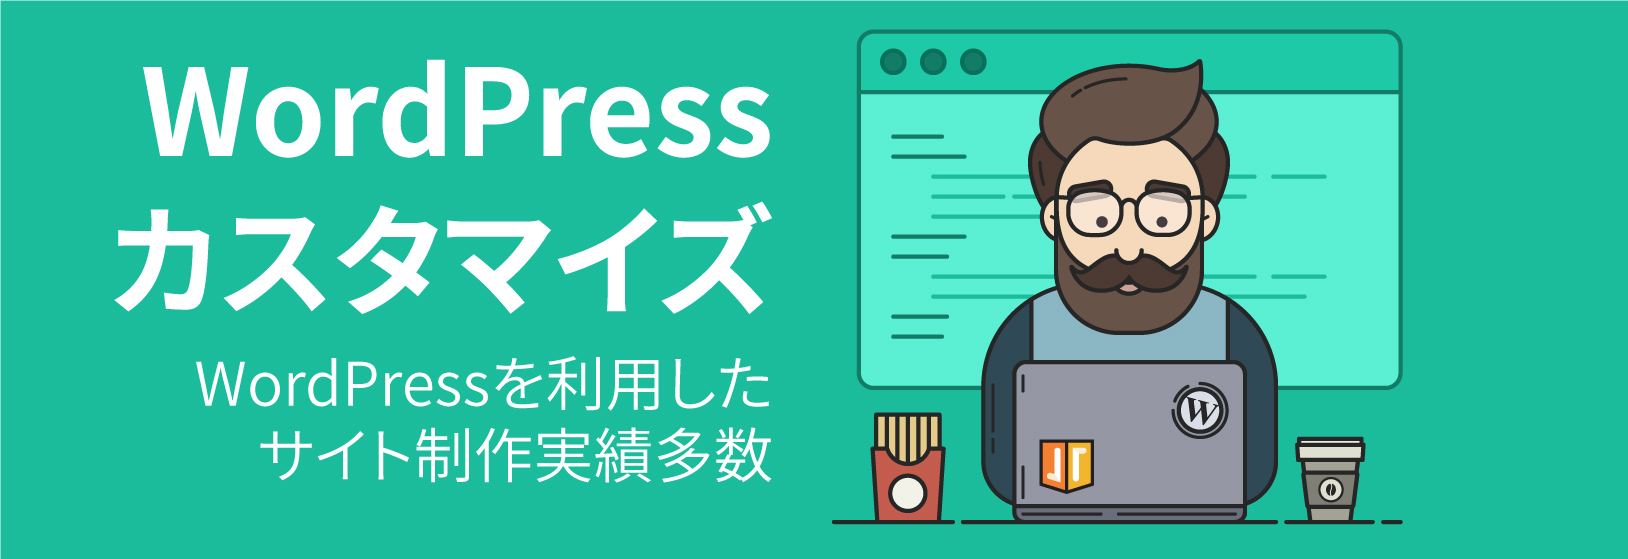 WordPressカスタマイズ WordPressを利用したサイト制作実績多数